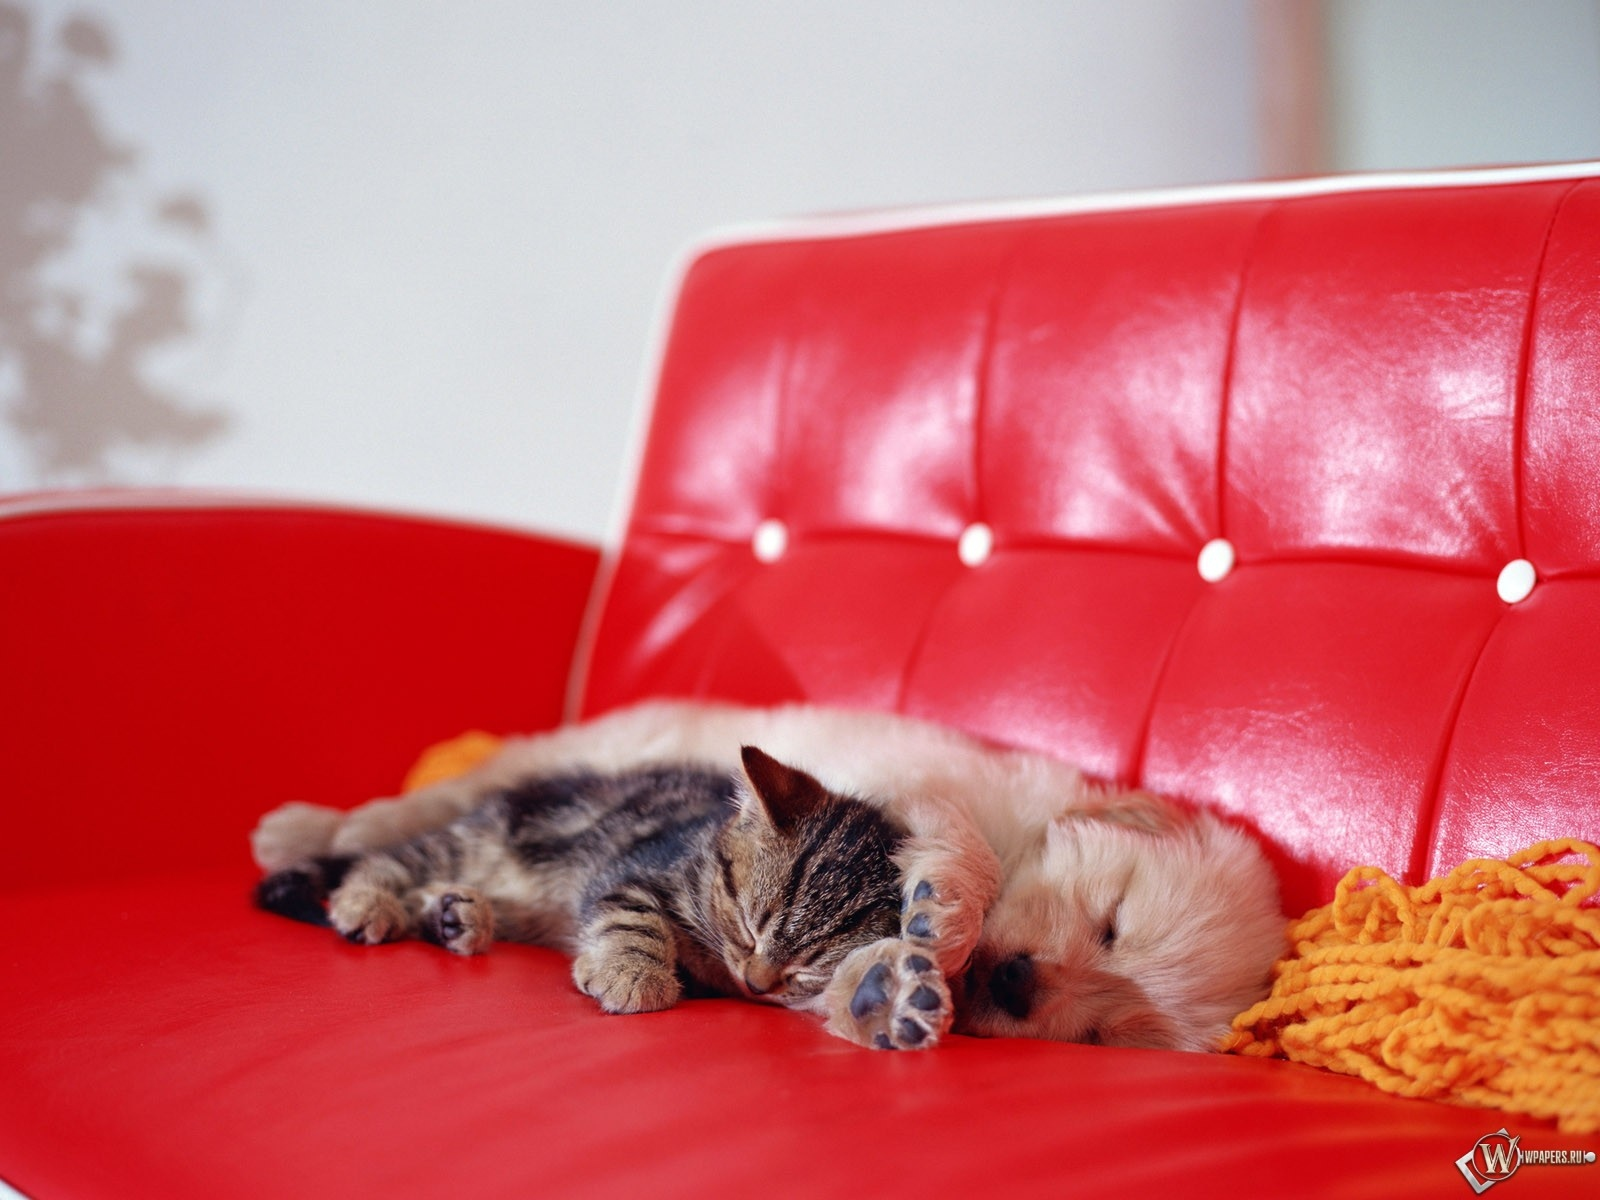 Котенок спит со щенком 1600x1200